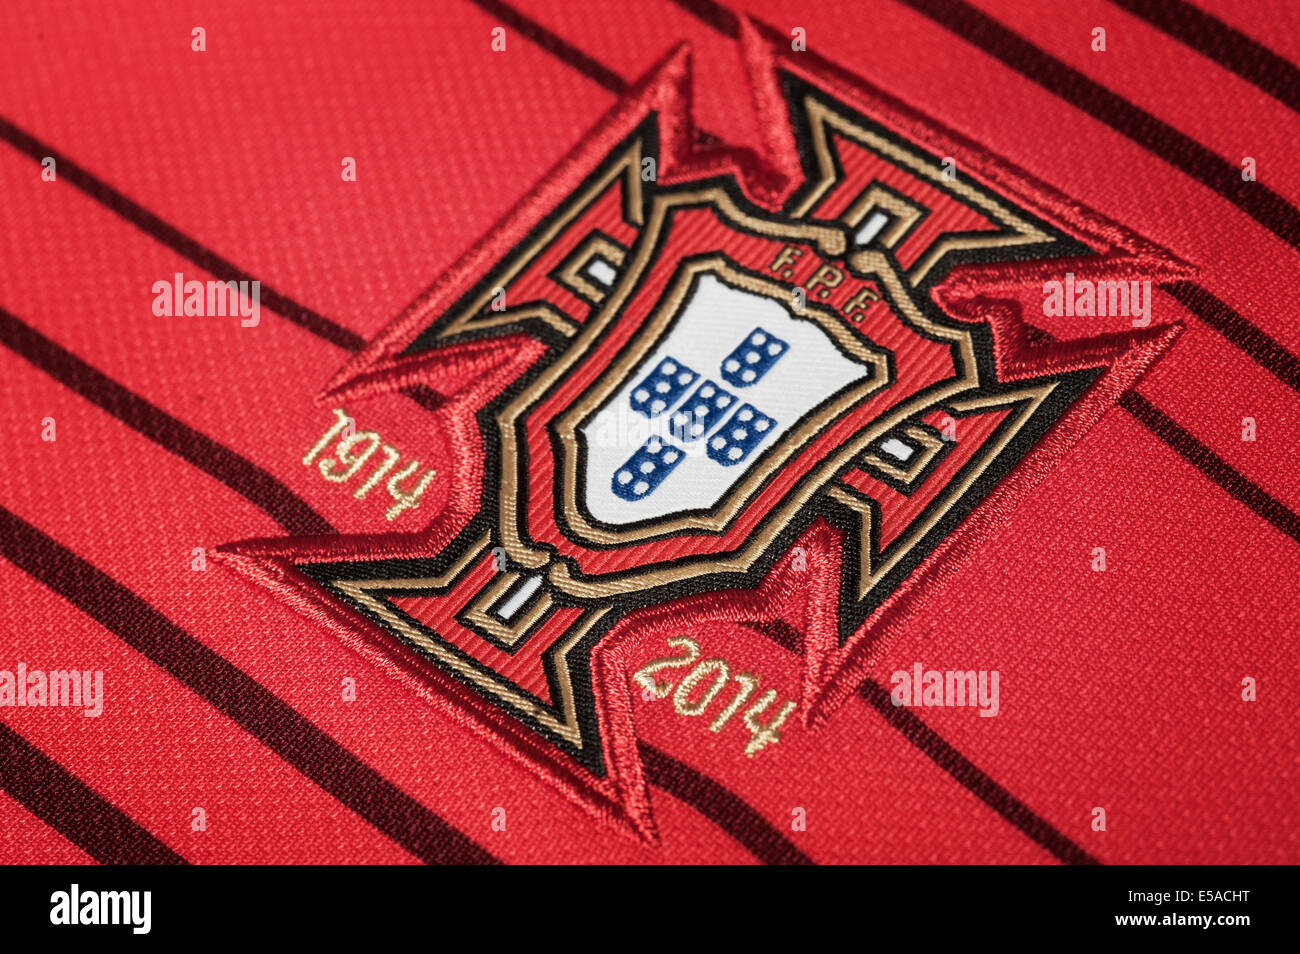 355368b8c64 Portugal National Football Team Stock Photos   Portugal National ...